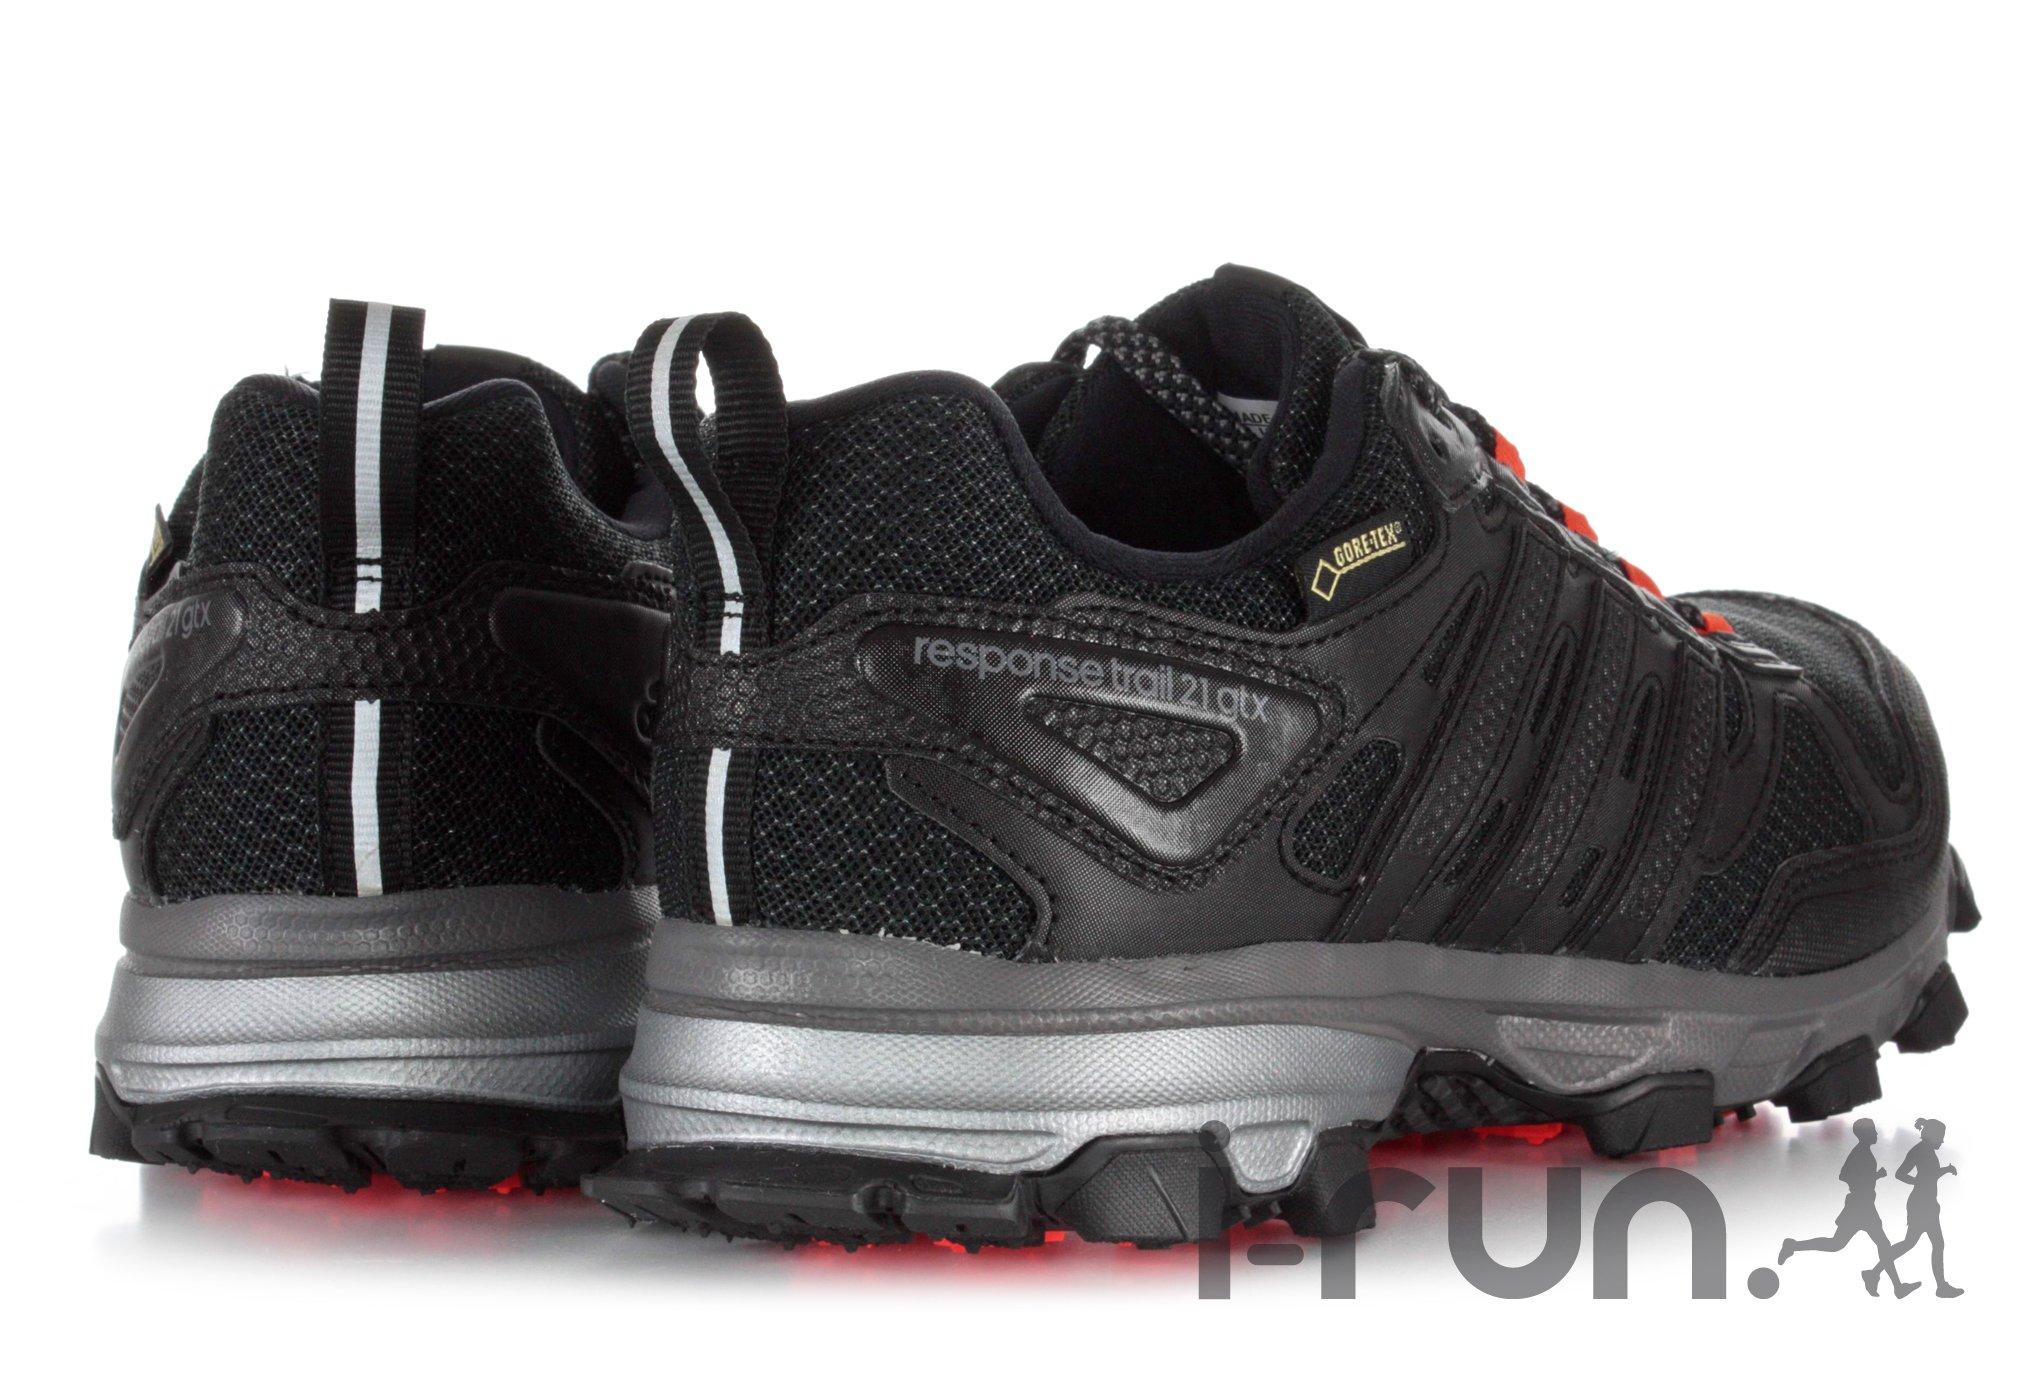 chaussure response trail 21